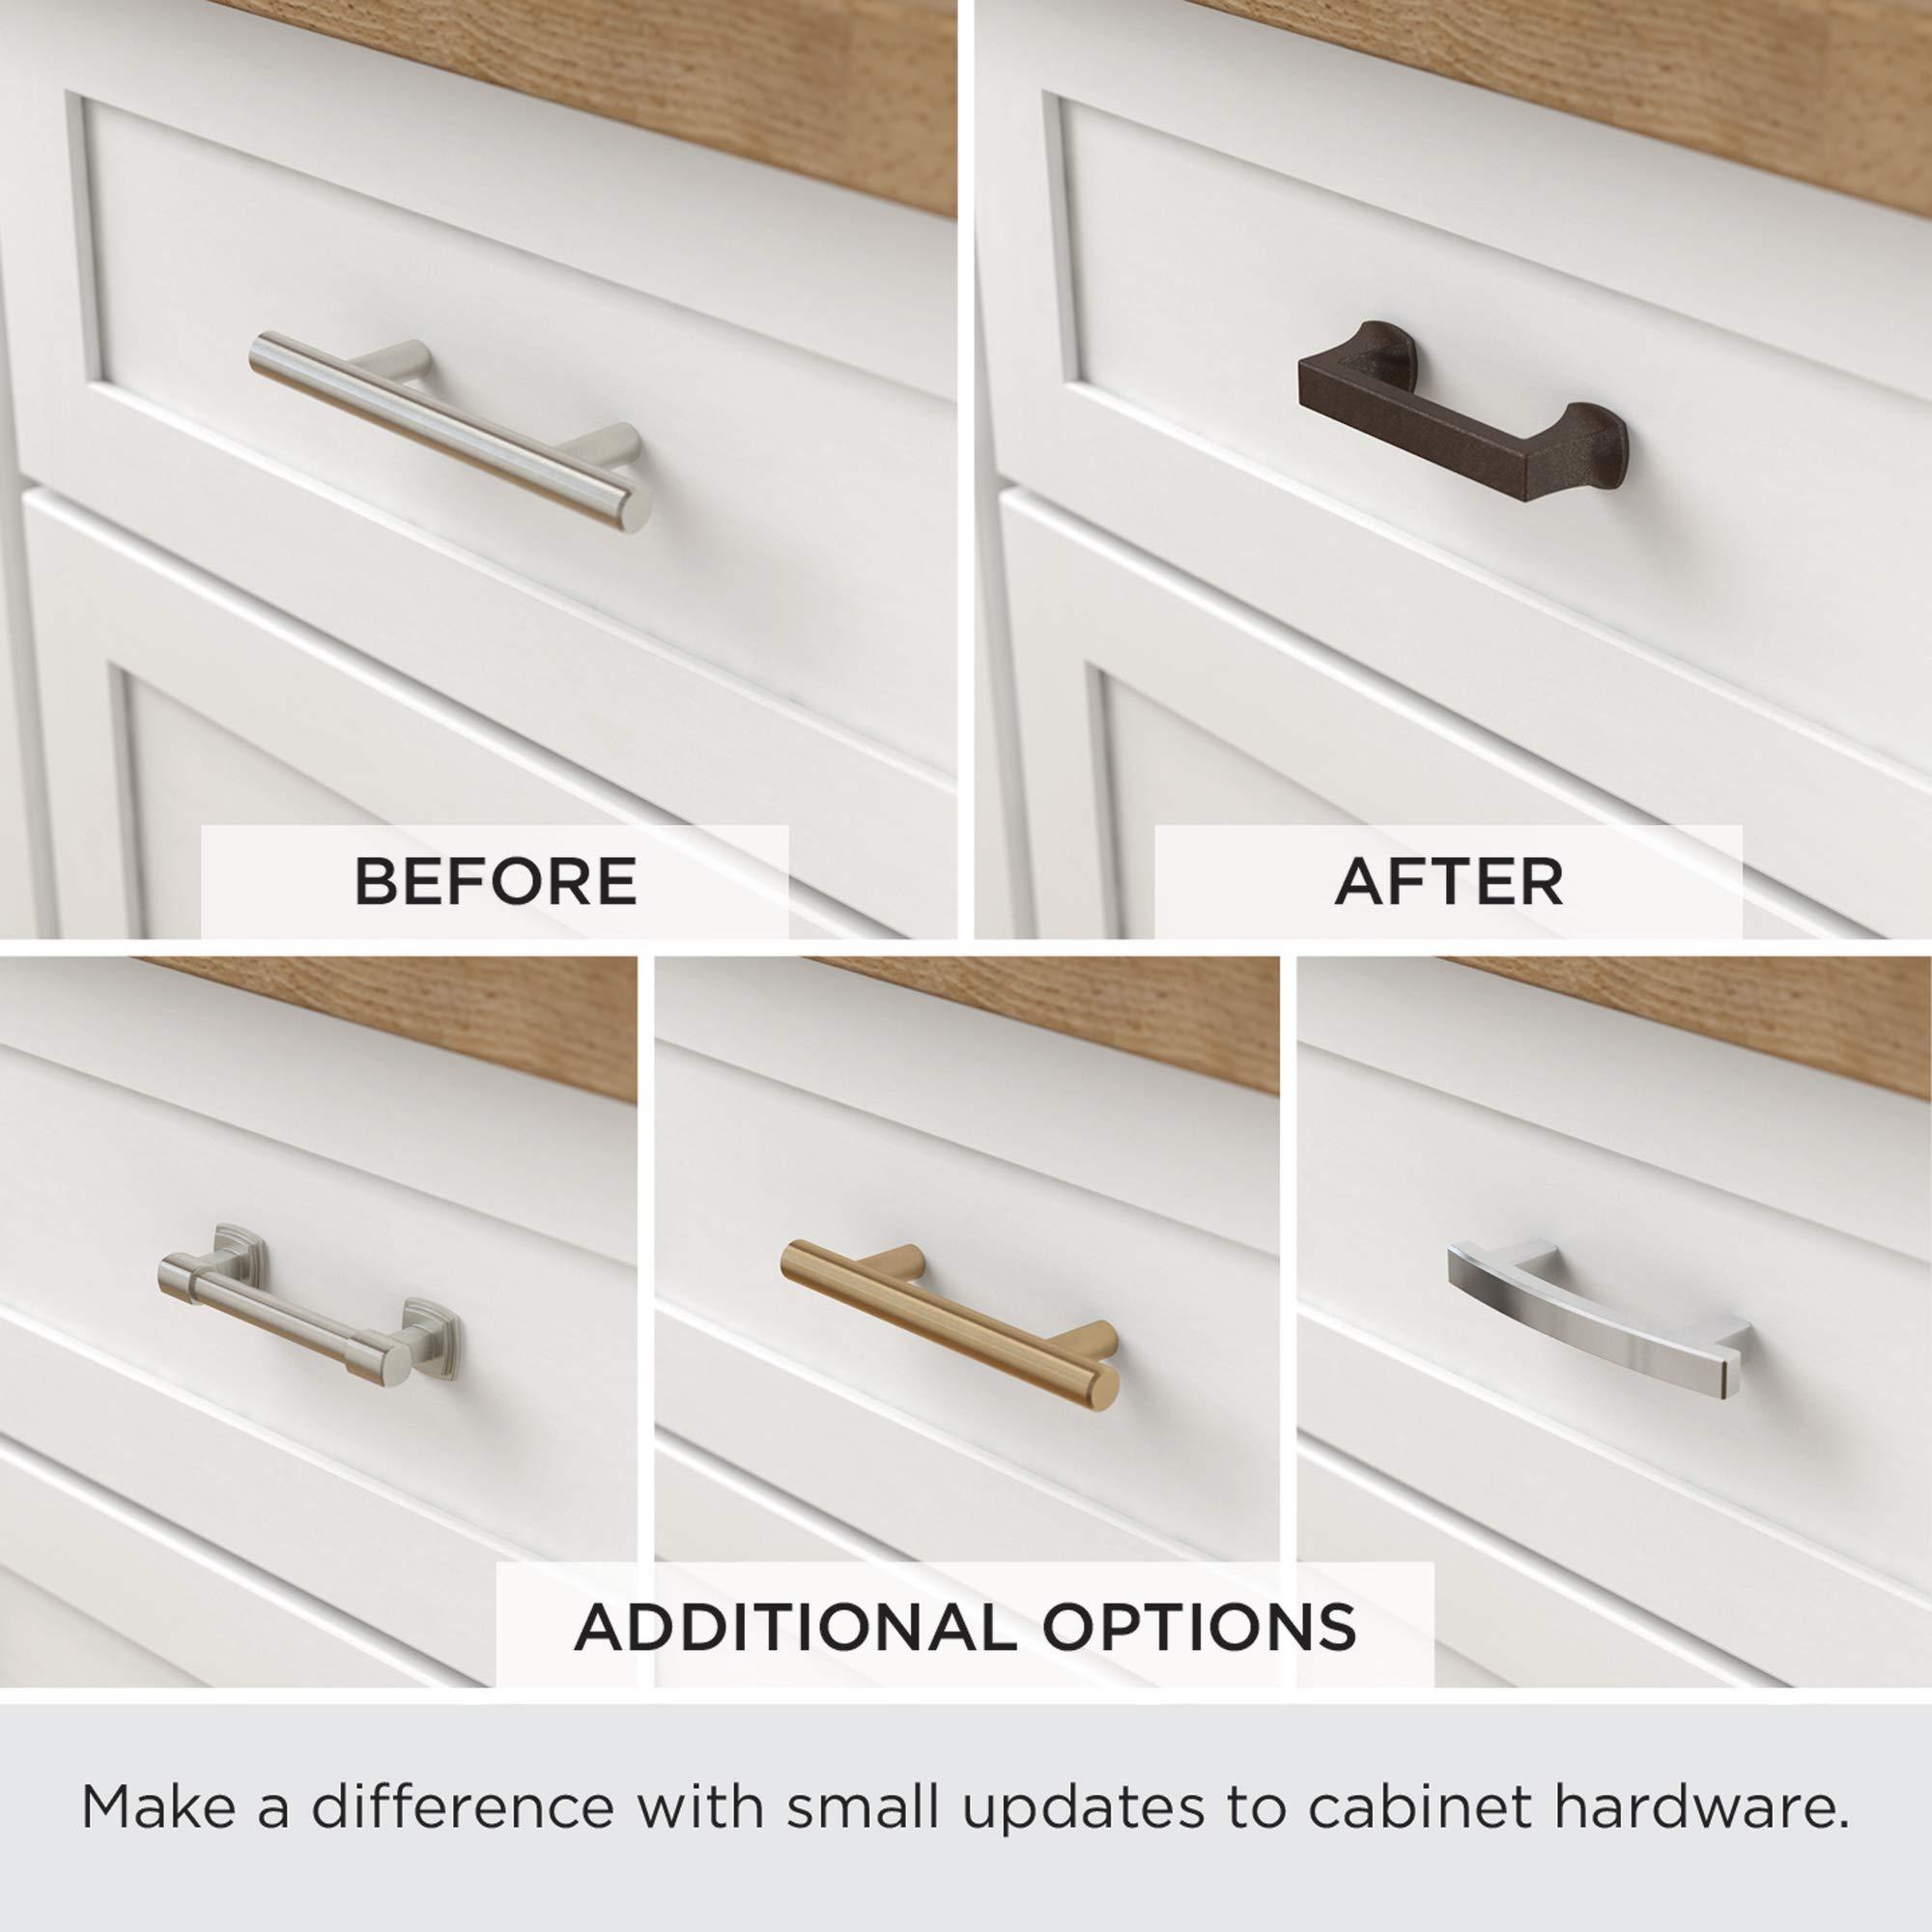 6 drawer pulls barn door handle cabinet knobs drawer knobs dresser cabinet shabby chic cast iron farmhouse rustic trunk handles BLACK